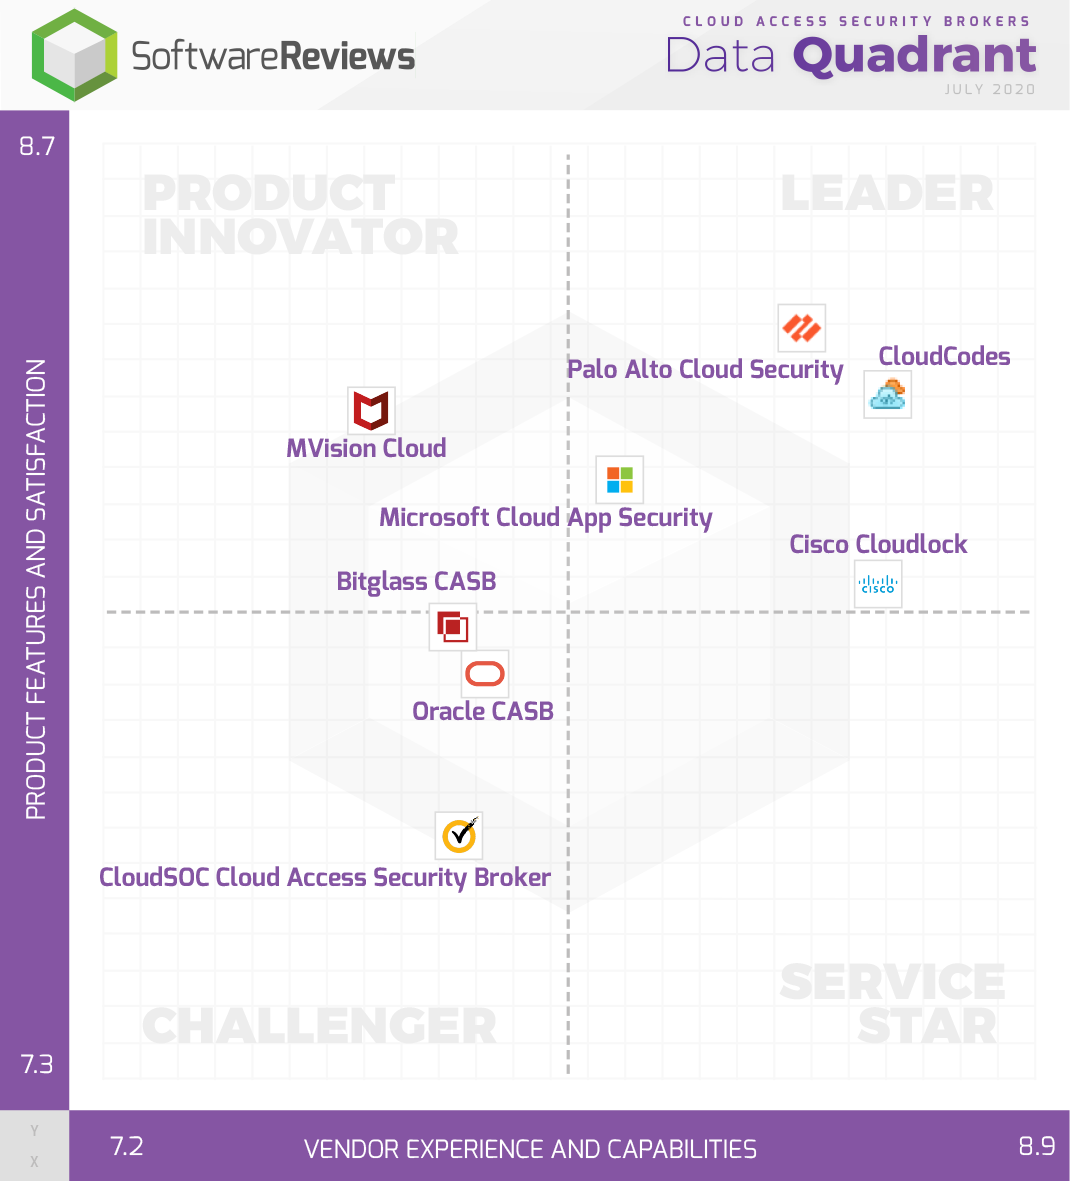 Cloud Access Security Brokers Data Quadrant